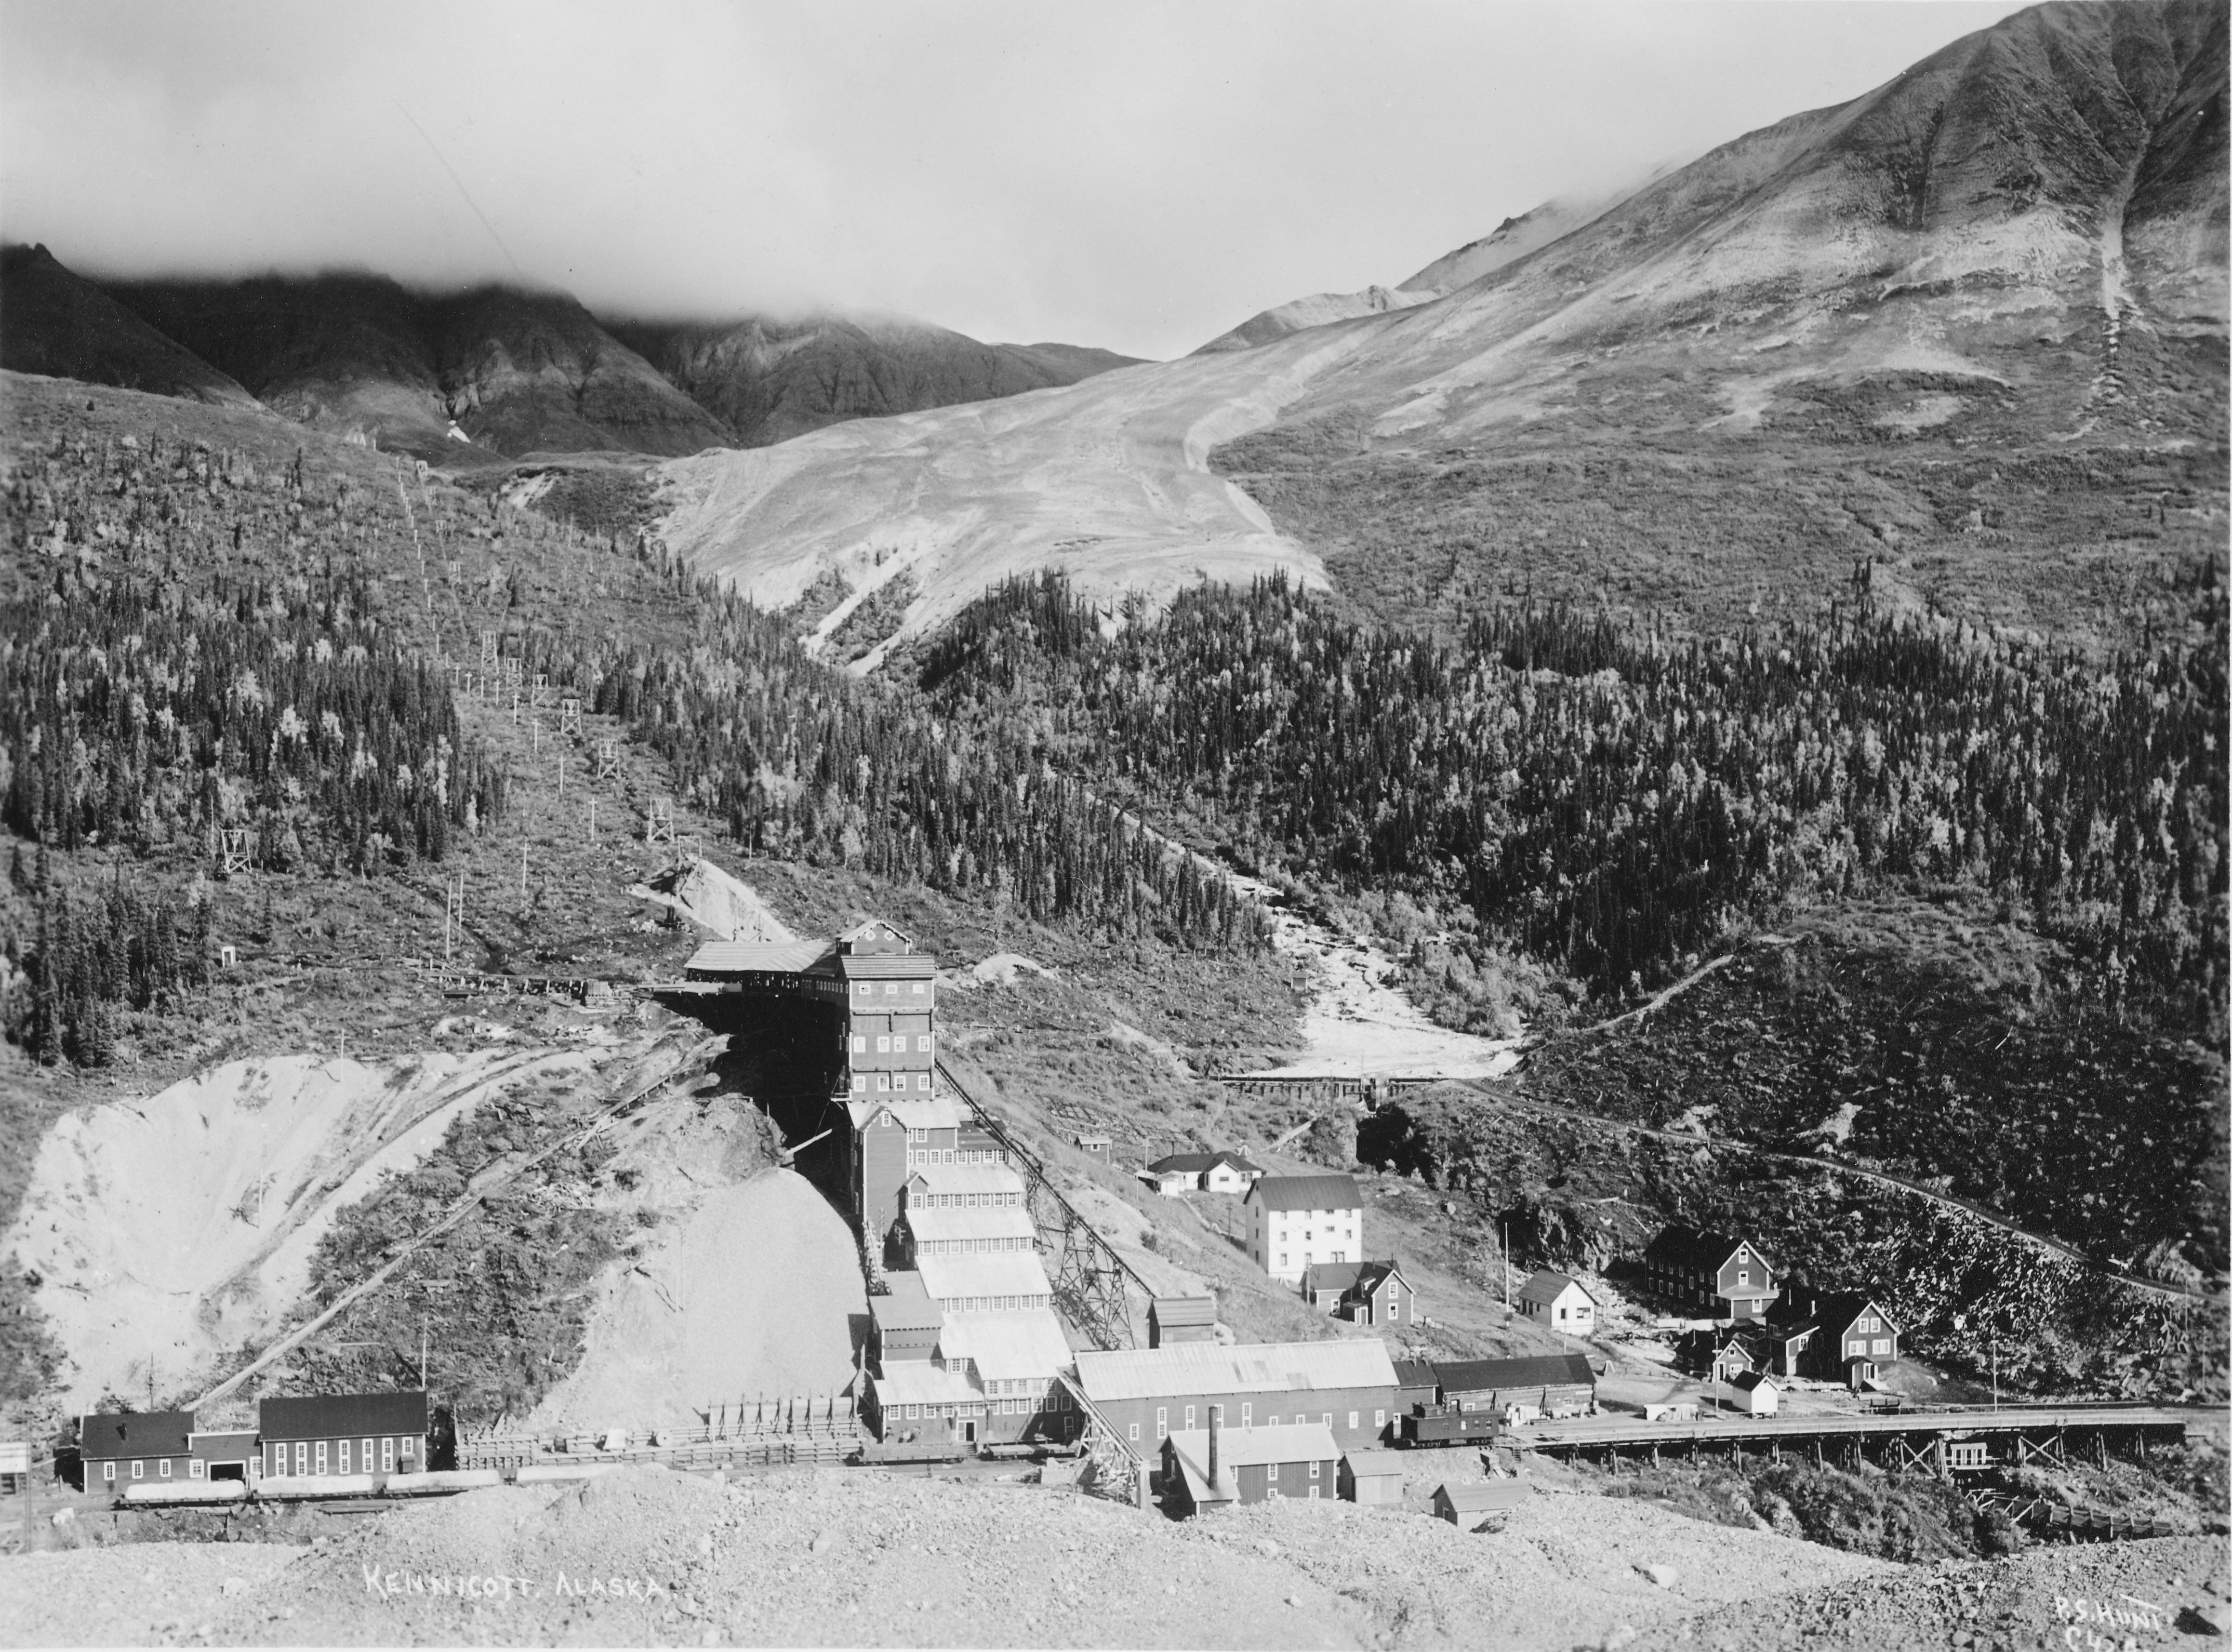 Kennecott miners